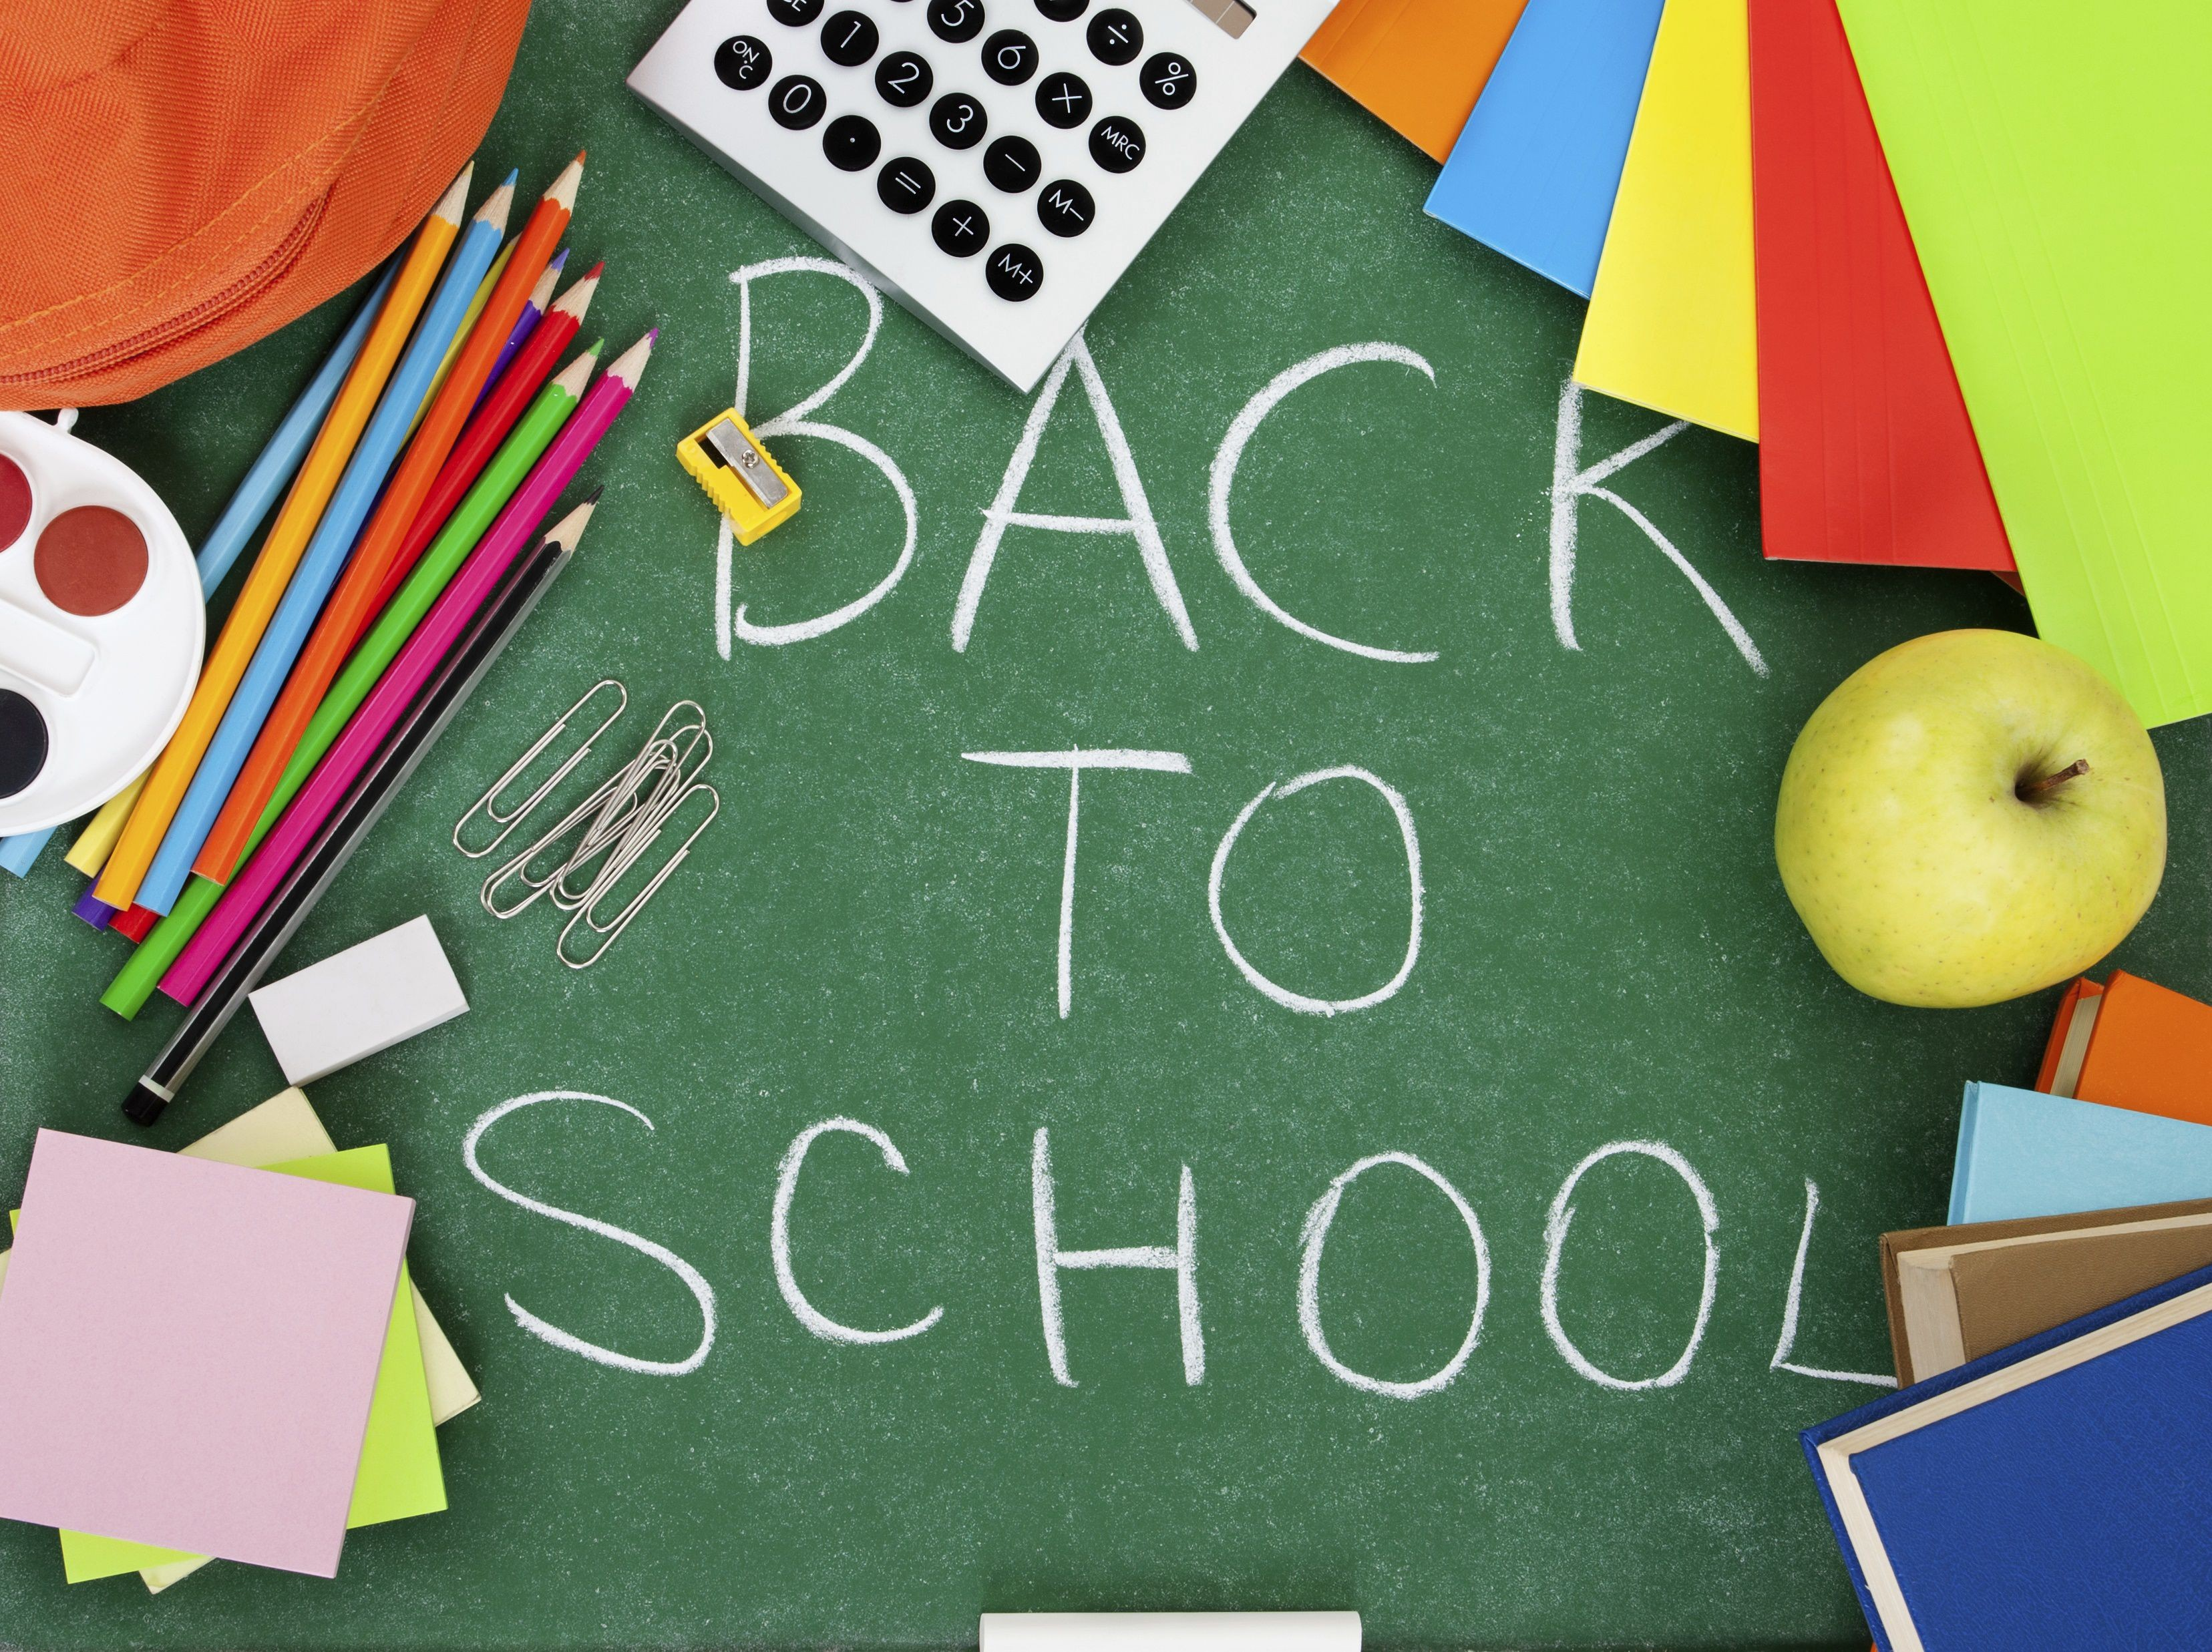 Getty back to school supplies LARGE Slobodan Vasic 56a13e623df78cf ba6c